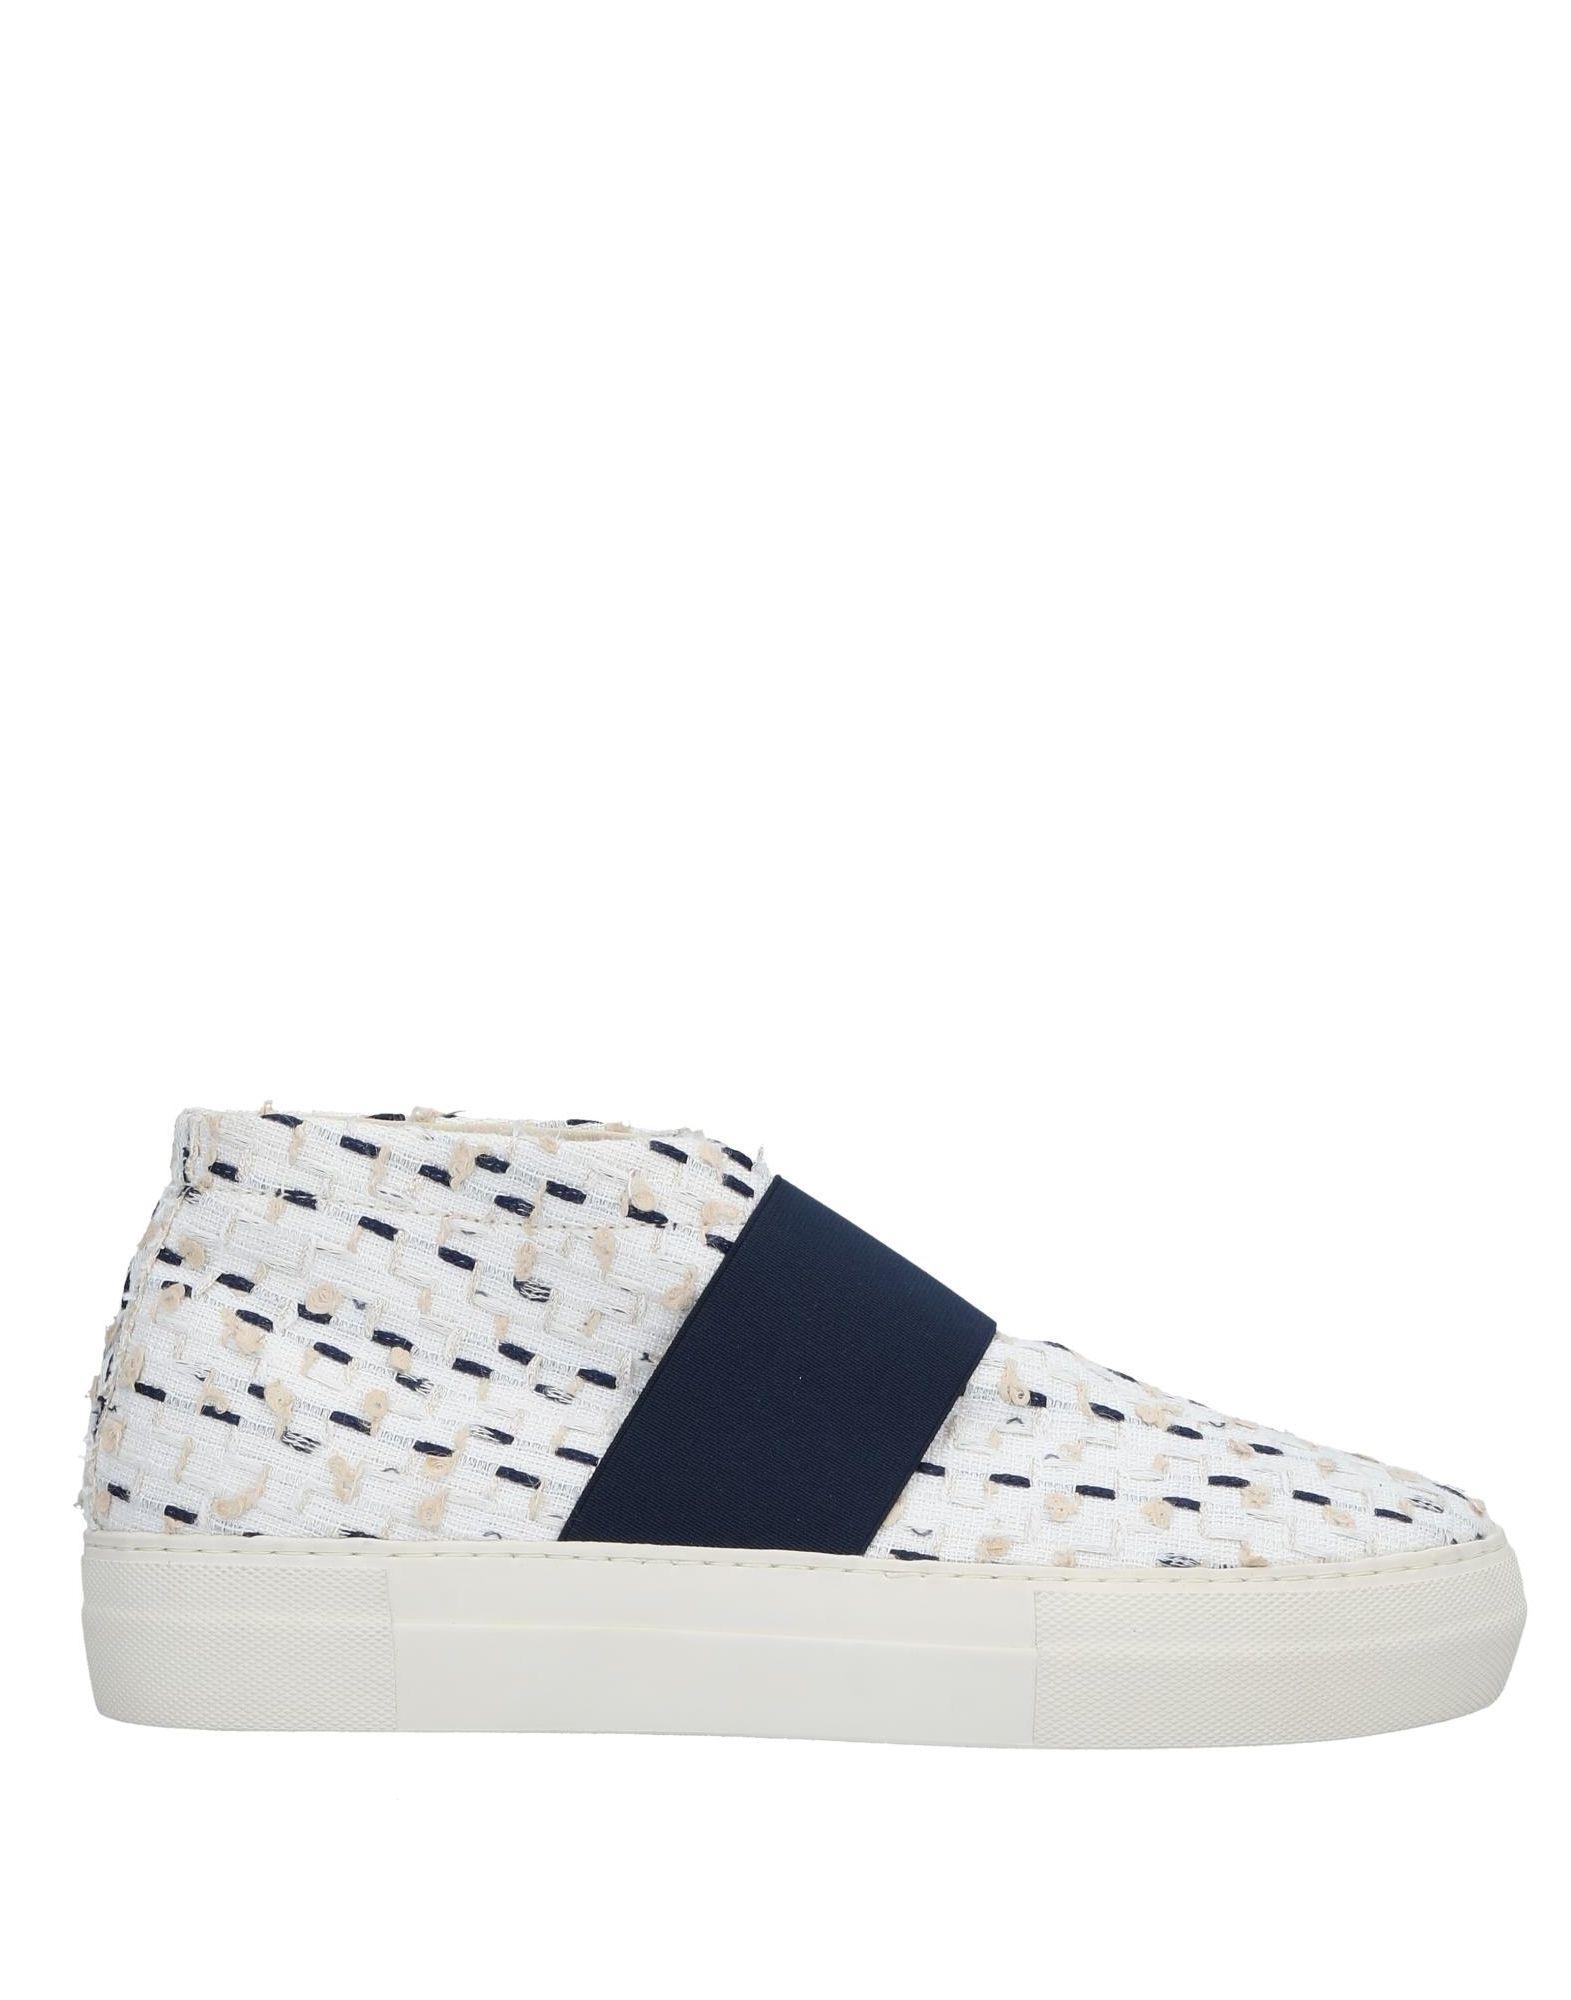 Diemme Sneakers Damen  11500848TW Gute Qualität beliebte Schuhe